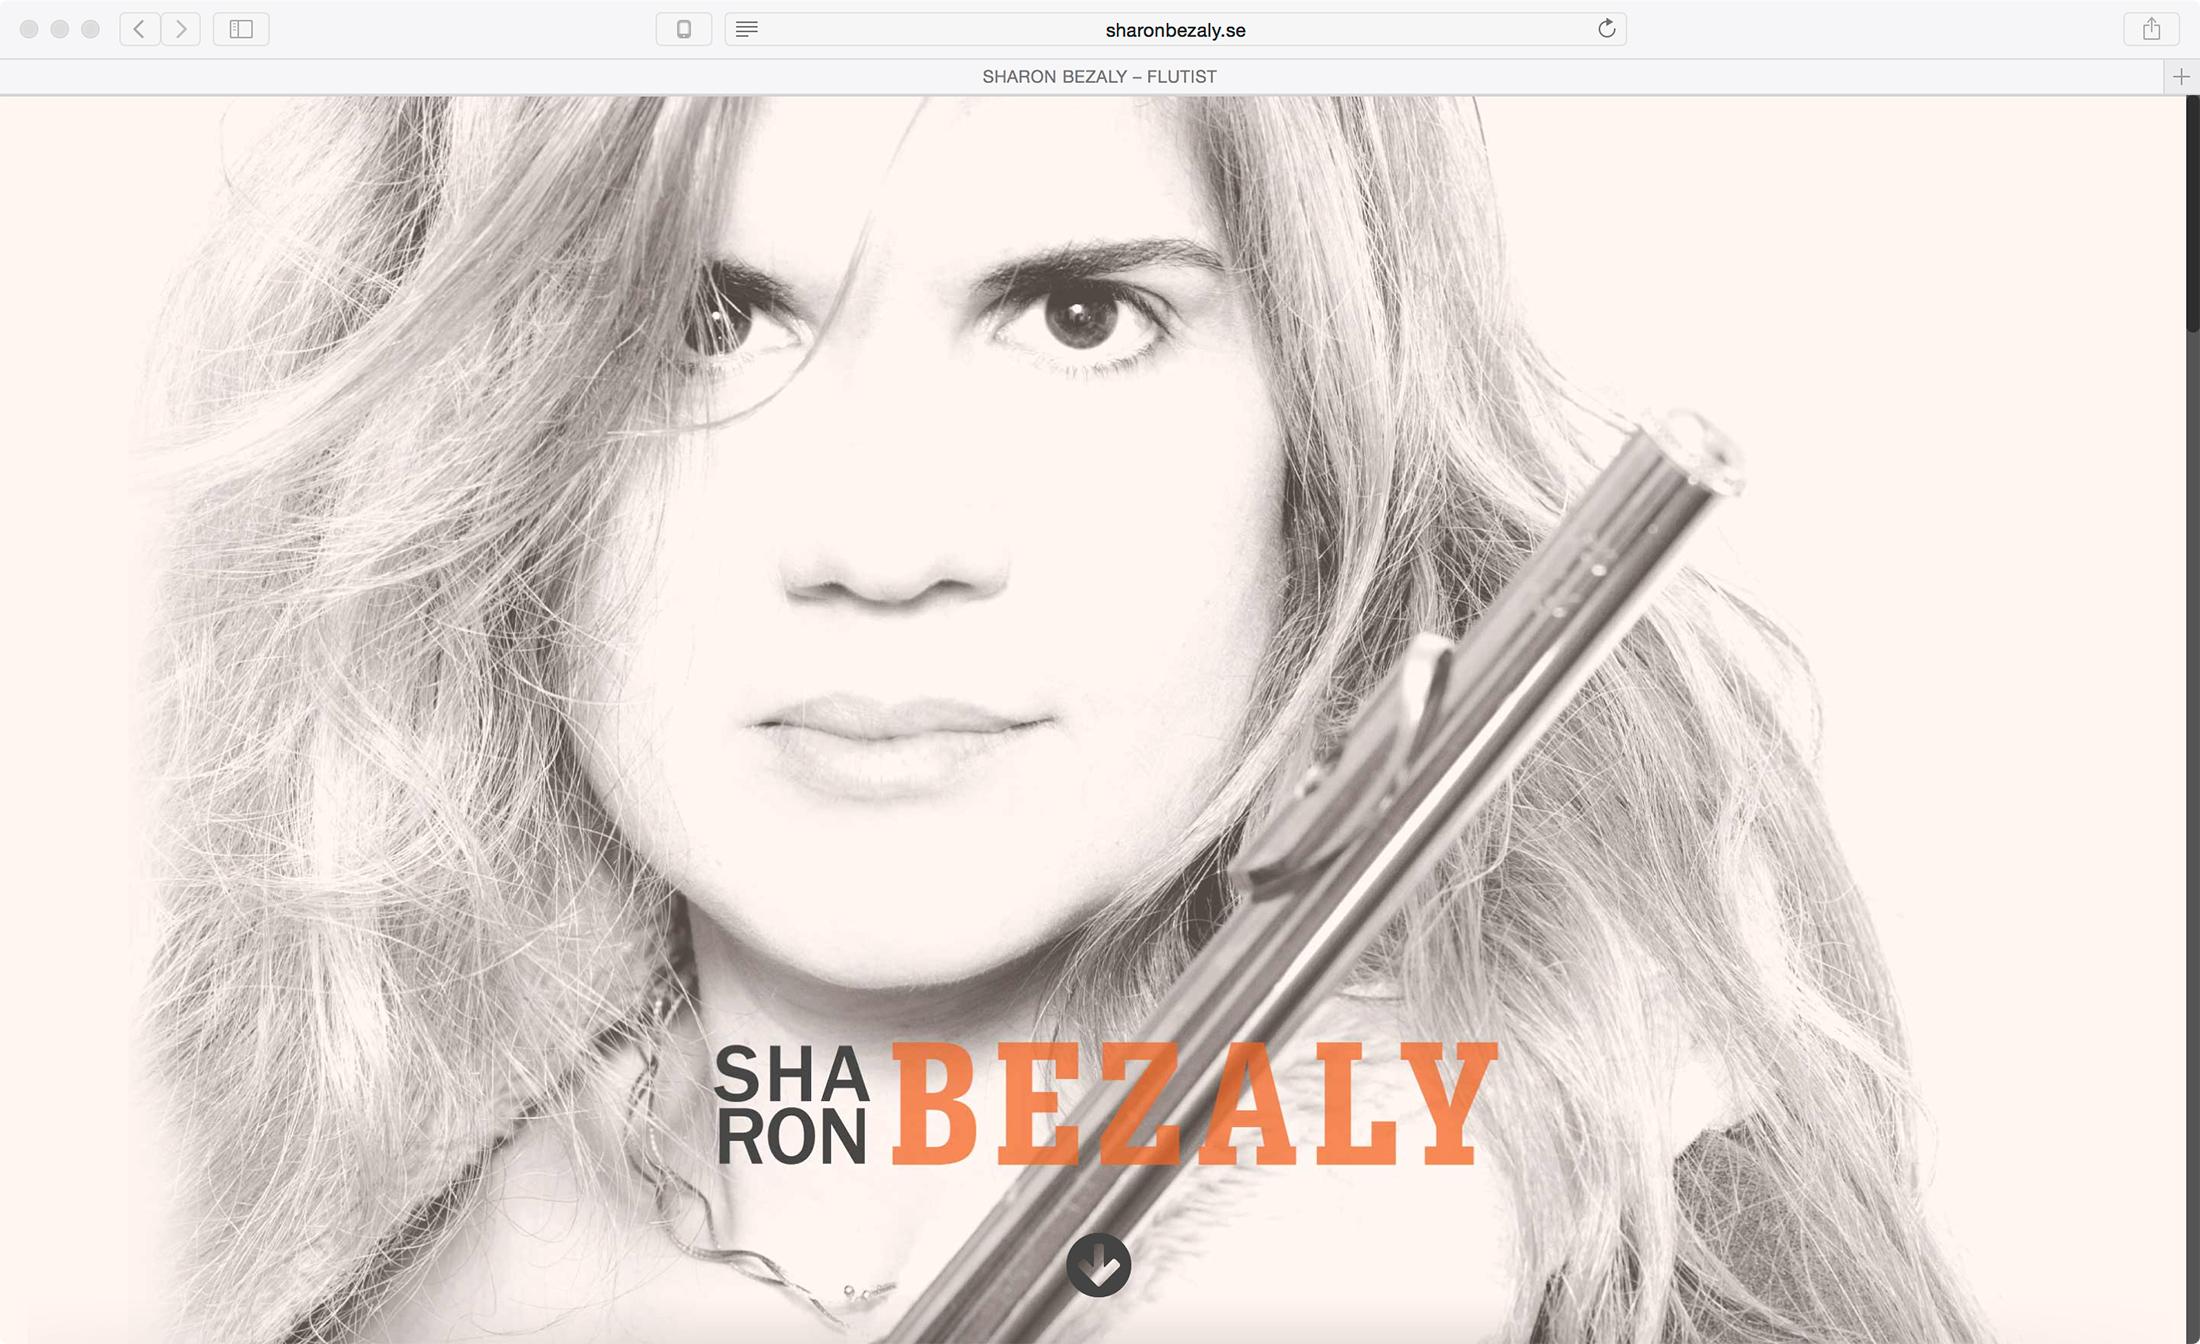 Sharon Bezaly Website Link